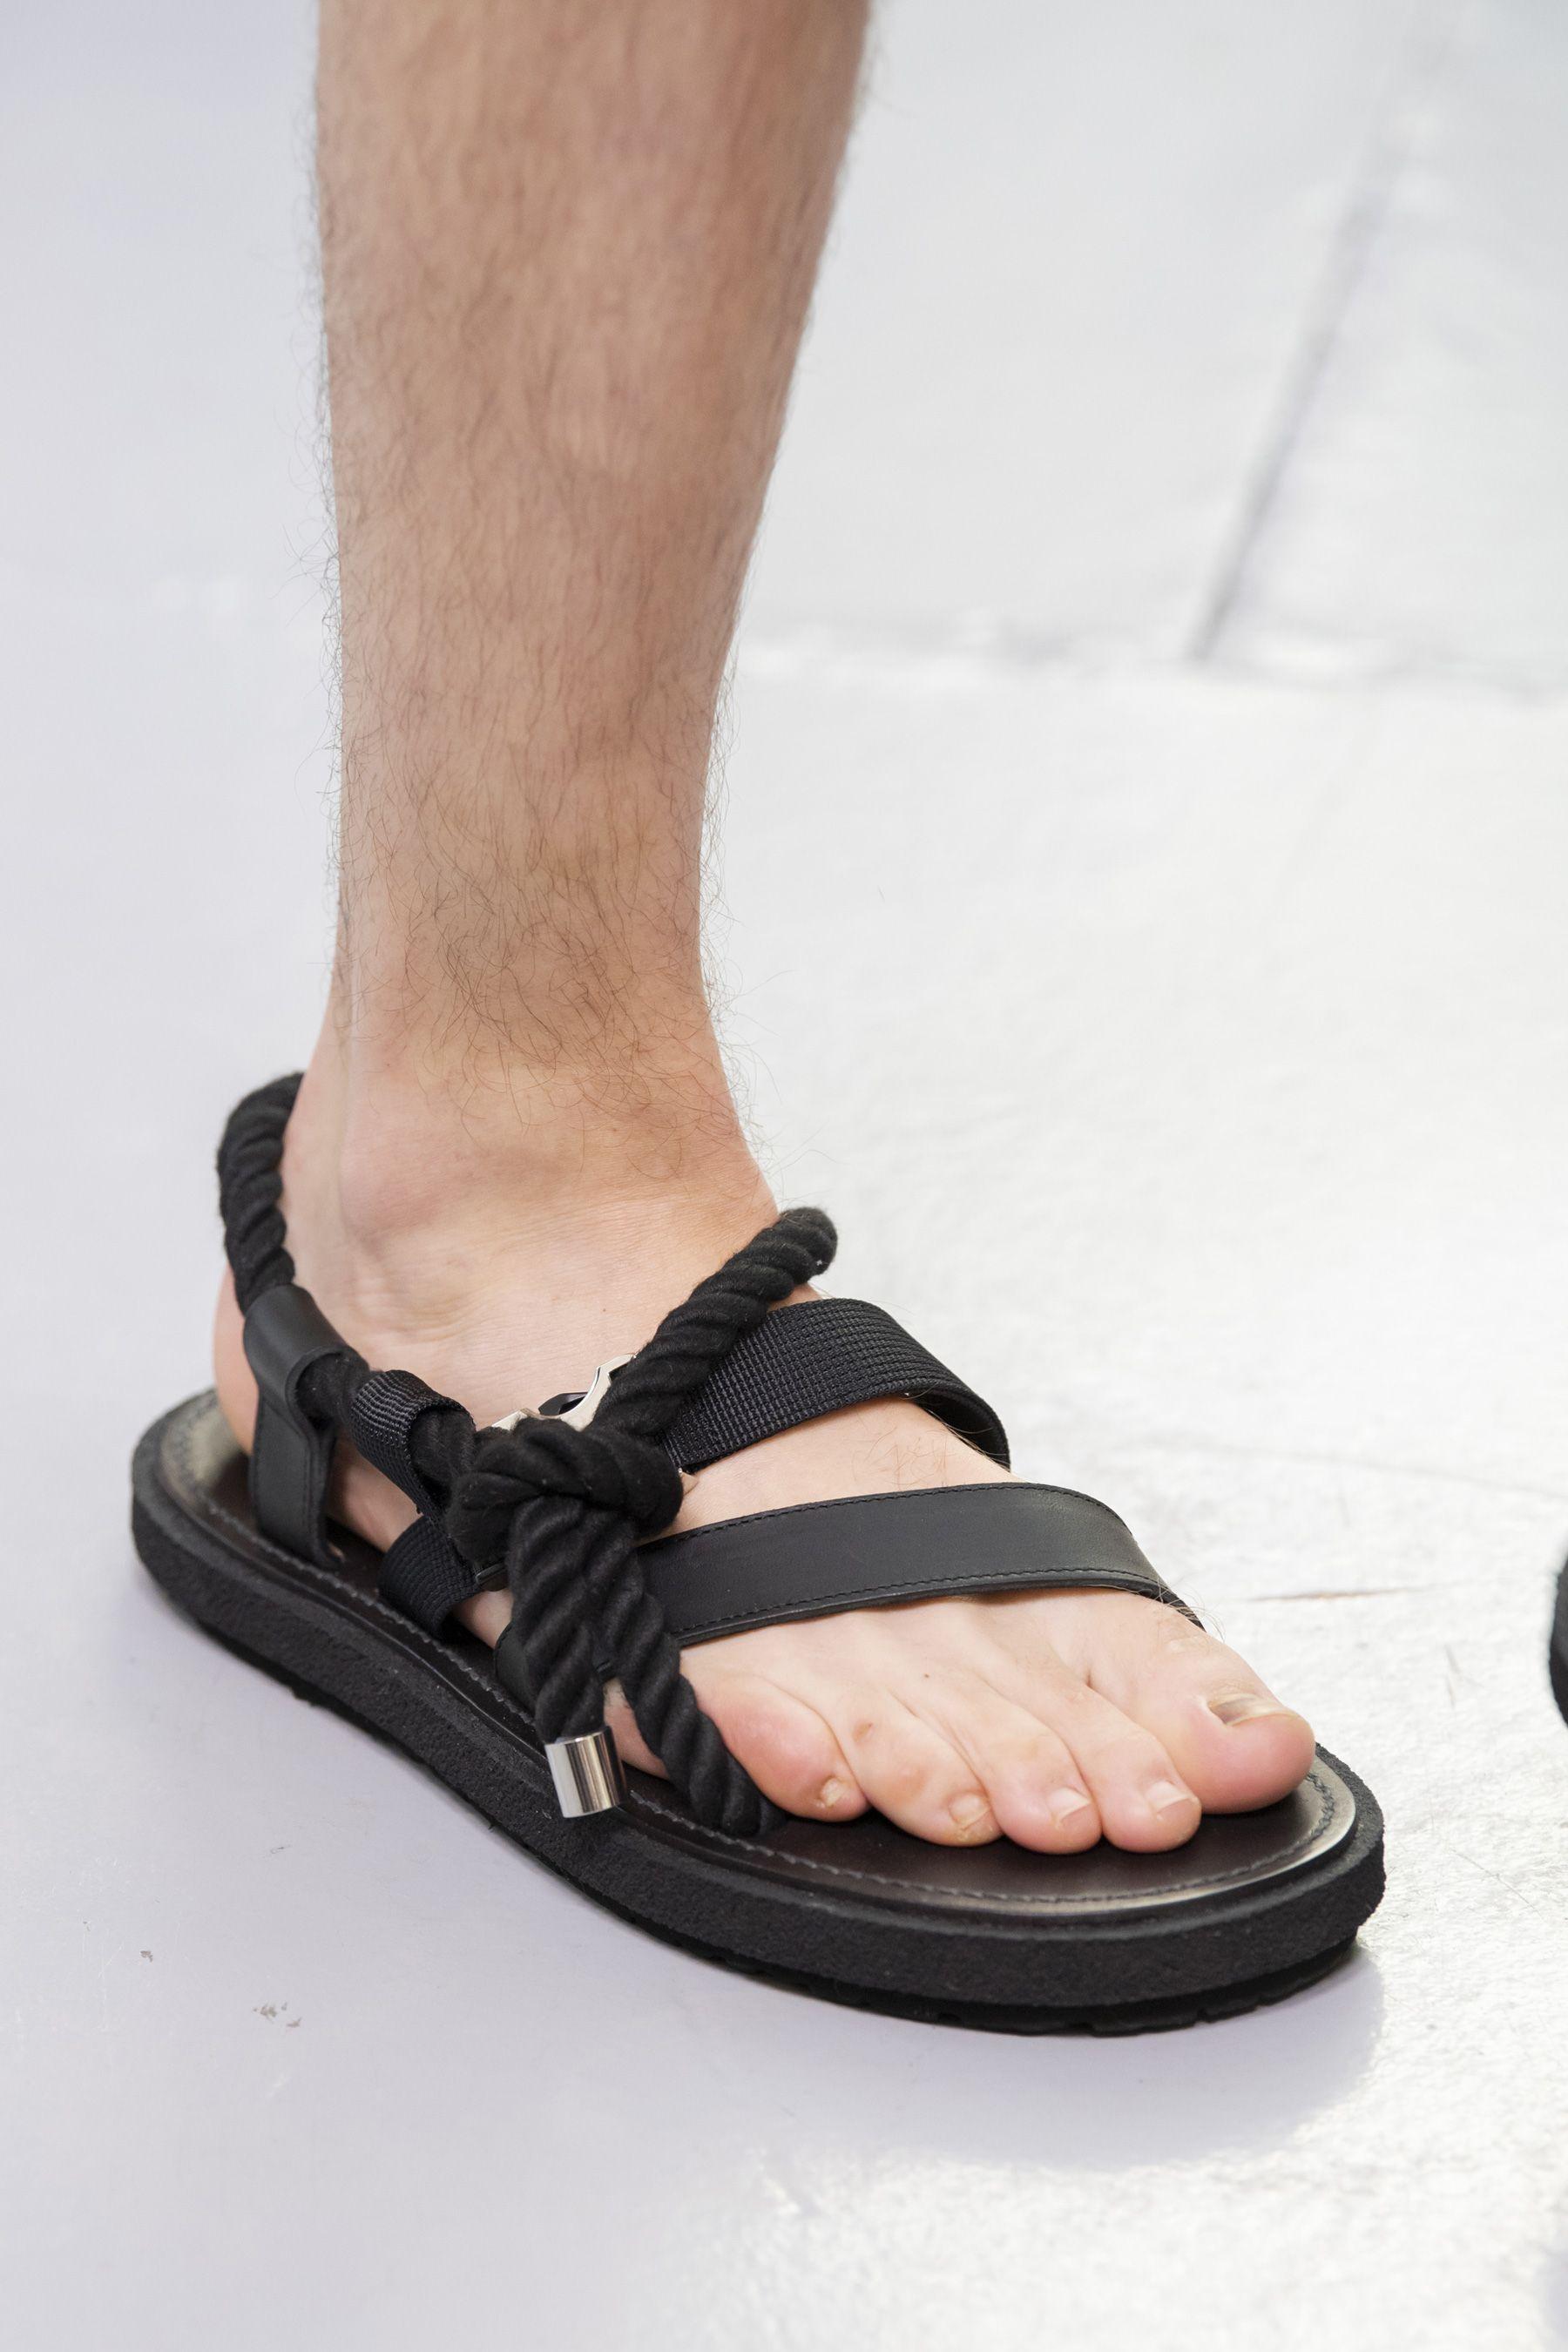 Mens sandals fashion, Men fashion show